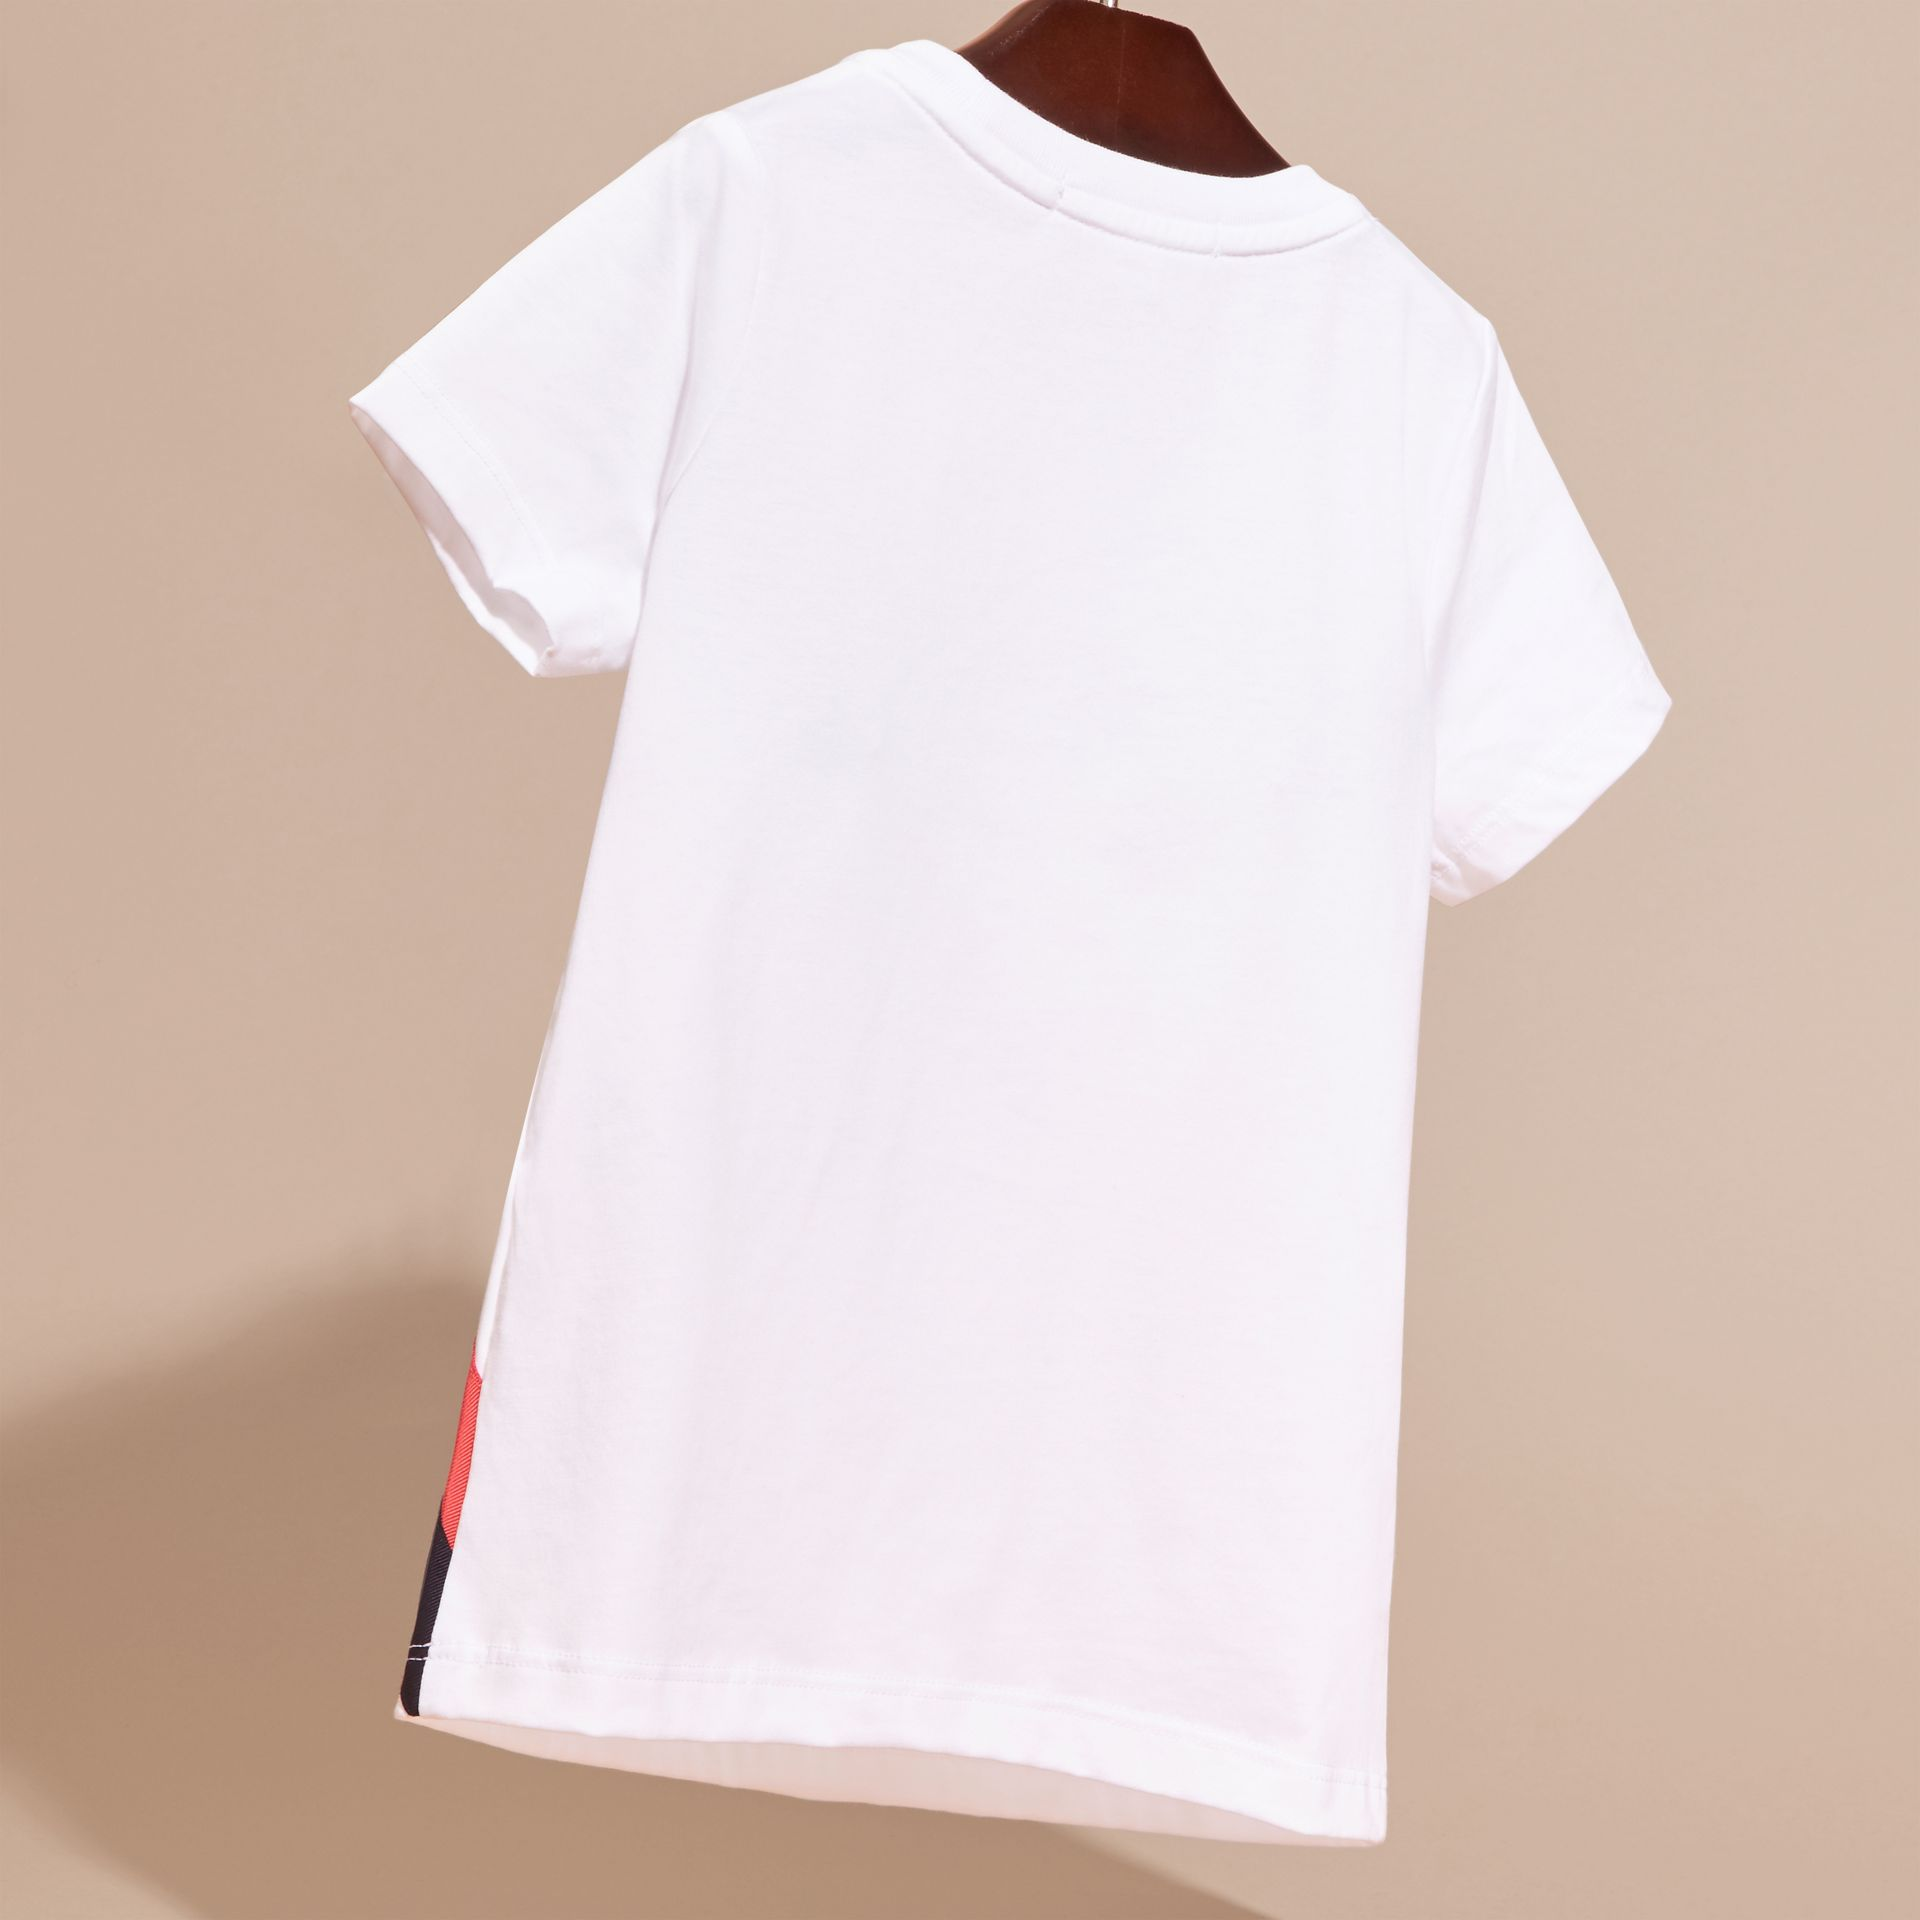 Sequin Appliquéd Weather Graphic Cotton T-Shirt - gallery image 4